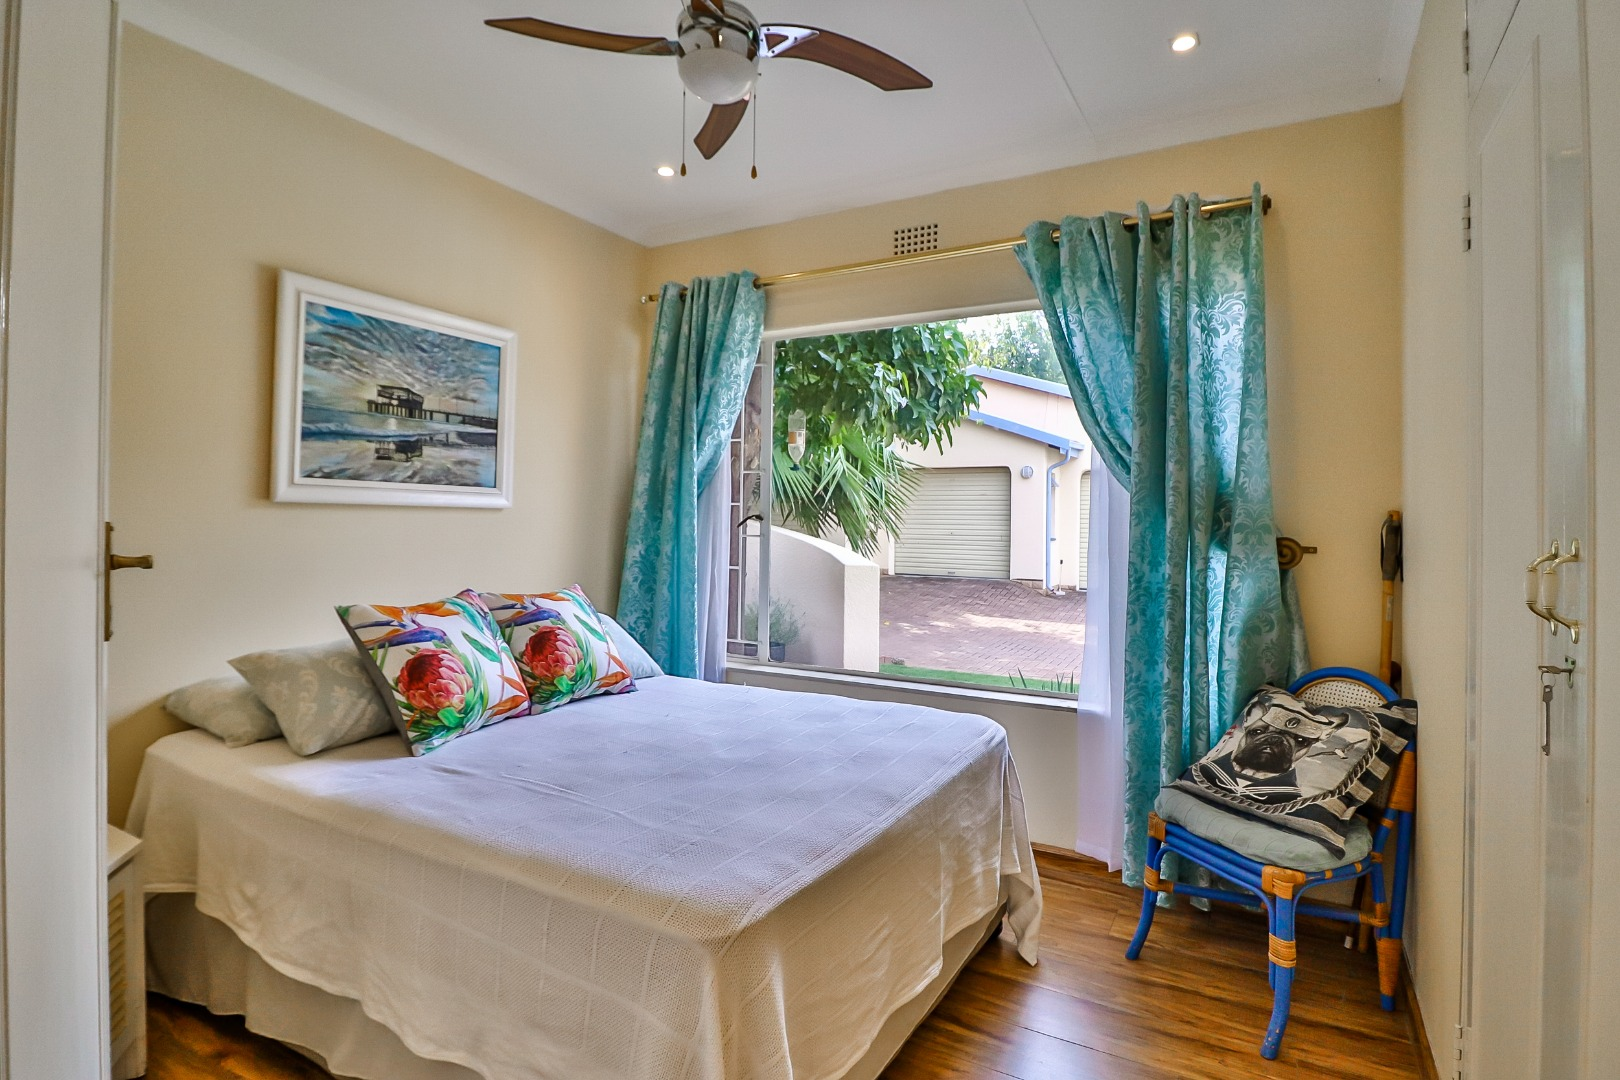 3 Bedroom House For Sale in Jukskei Park